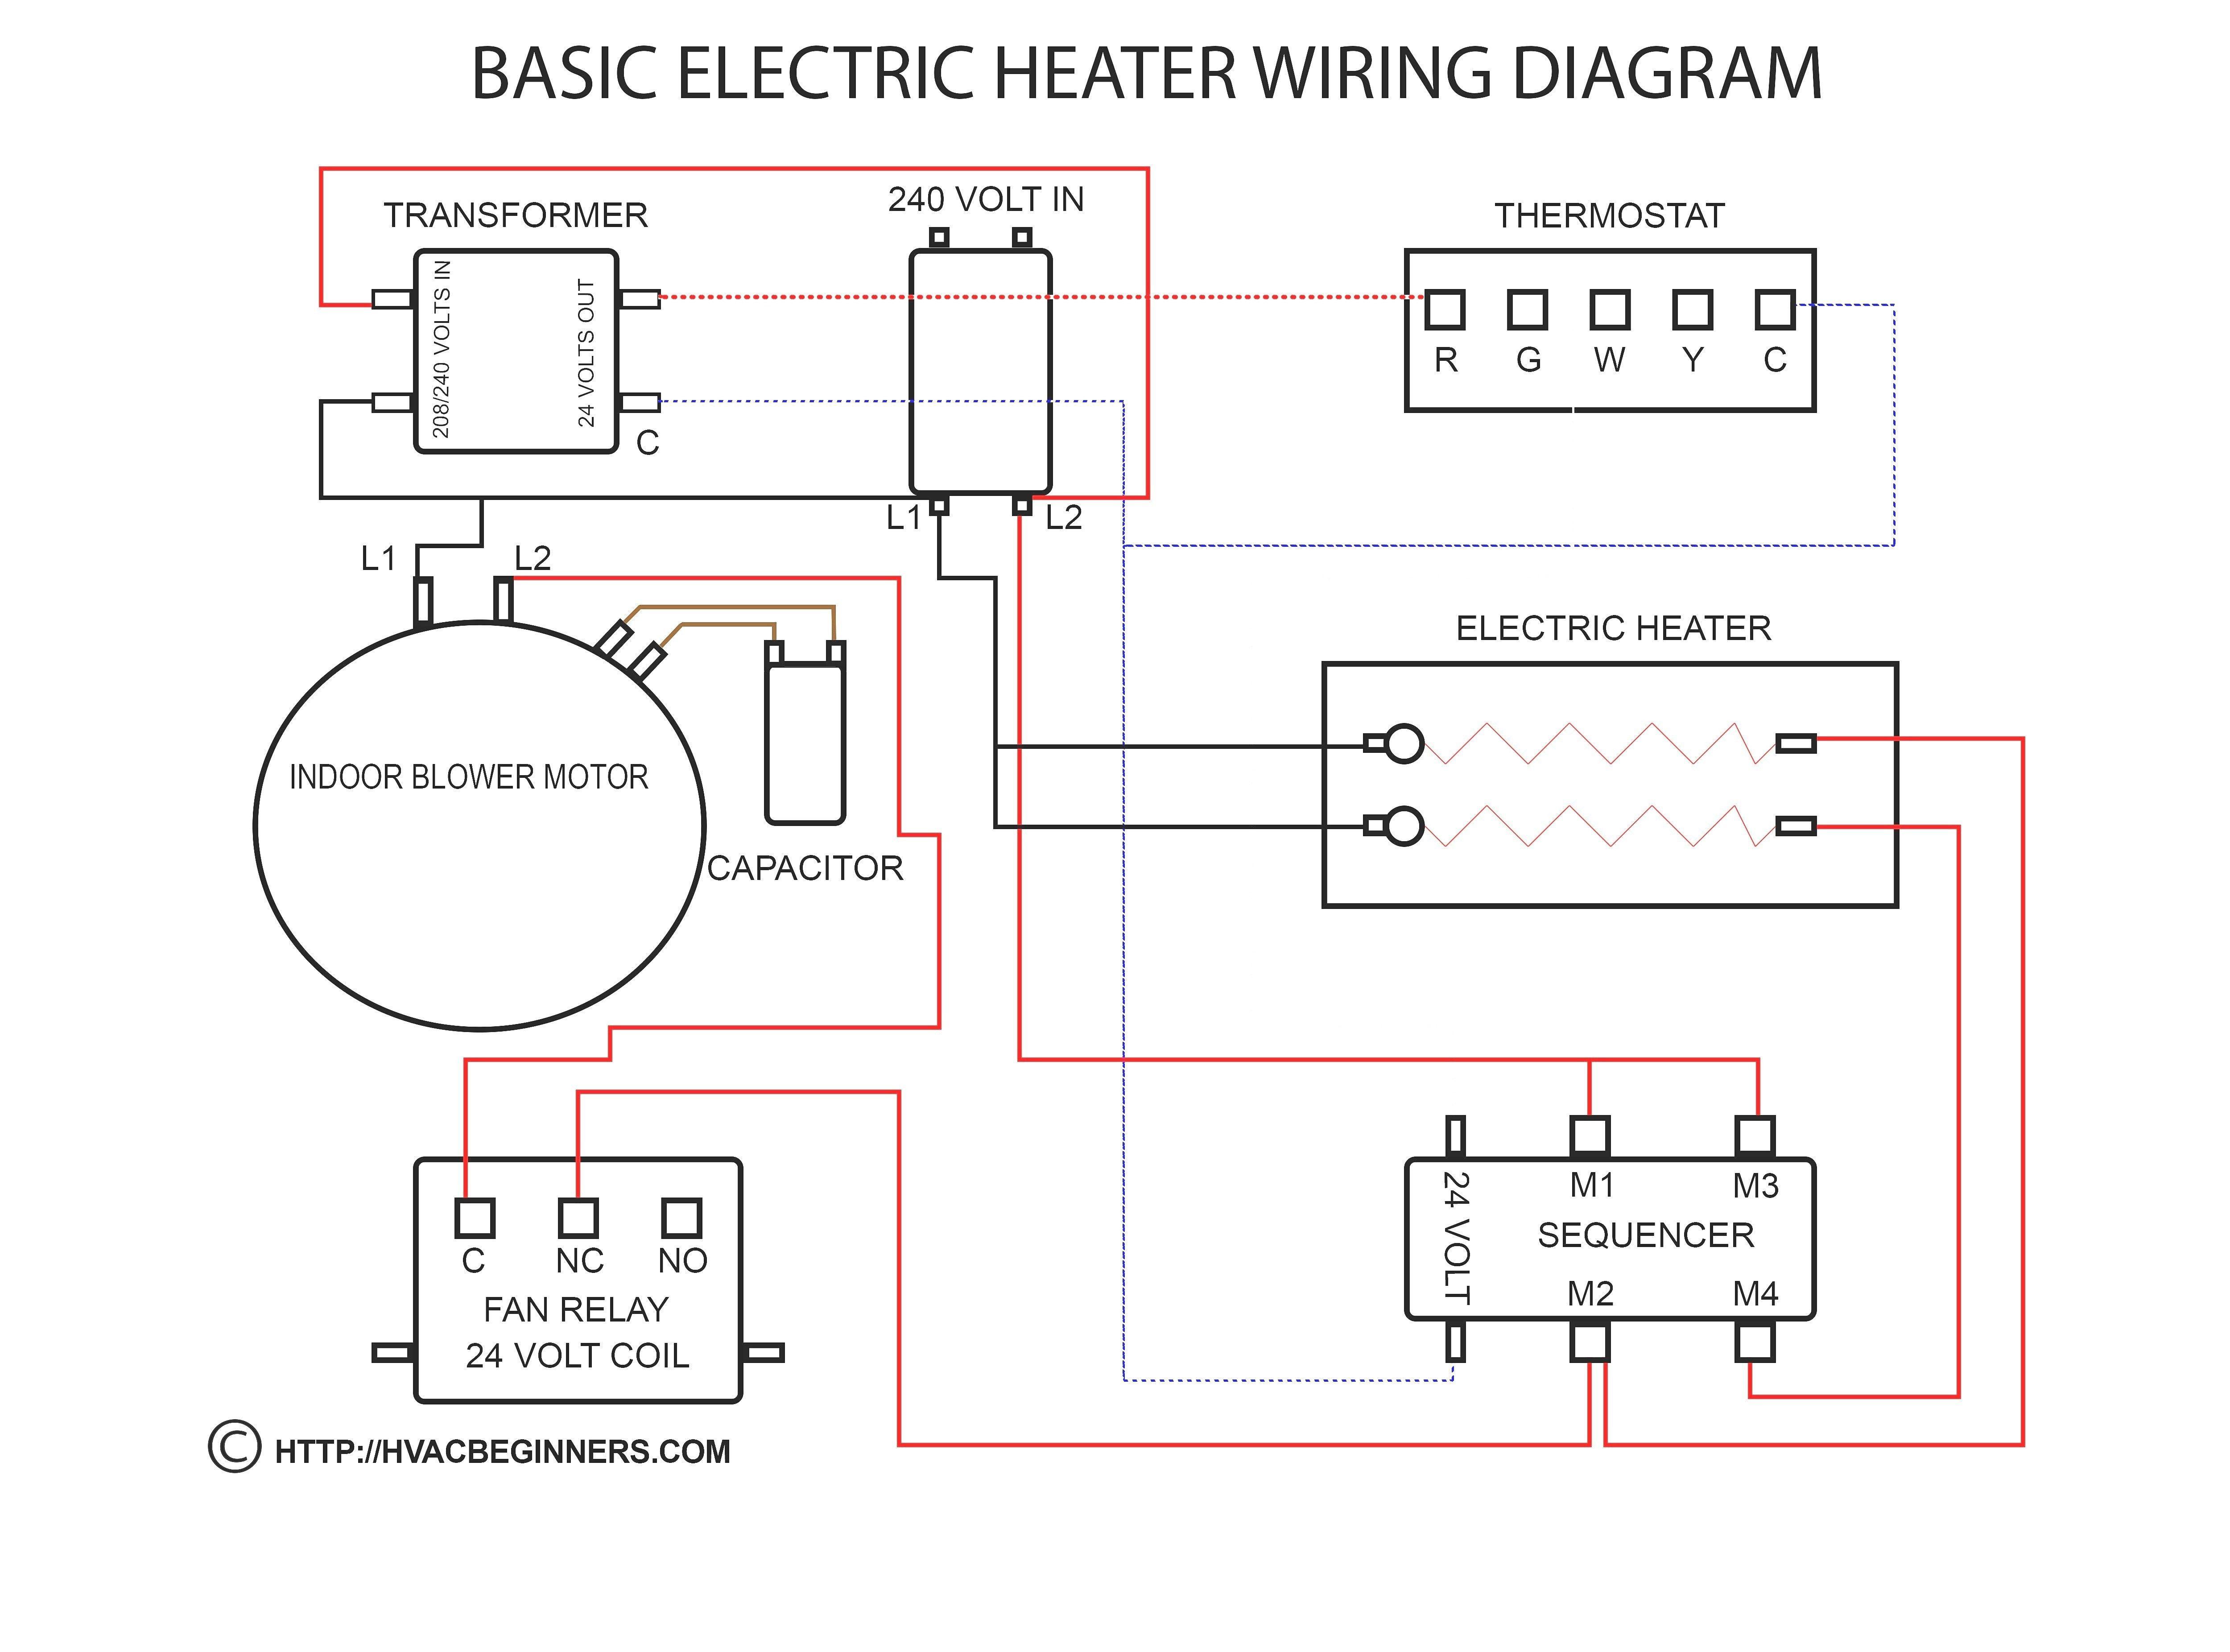 Circuit Diagram Design Sample Free Download #diagram #diagramtemplate  #diagramsample | Hvac Transformer Wiring Diagram Free Picture |  | Pinterest